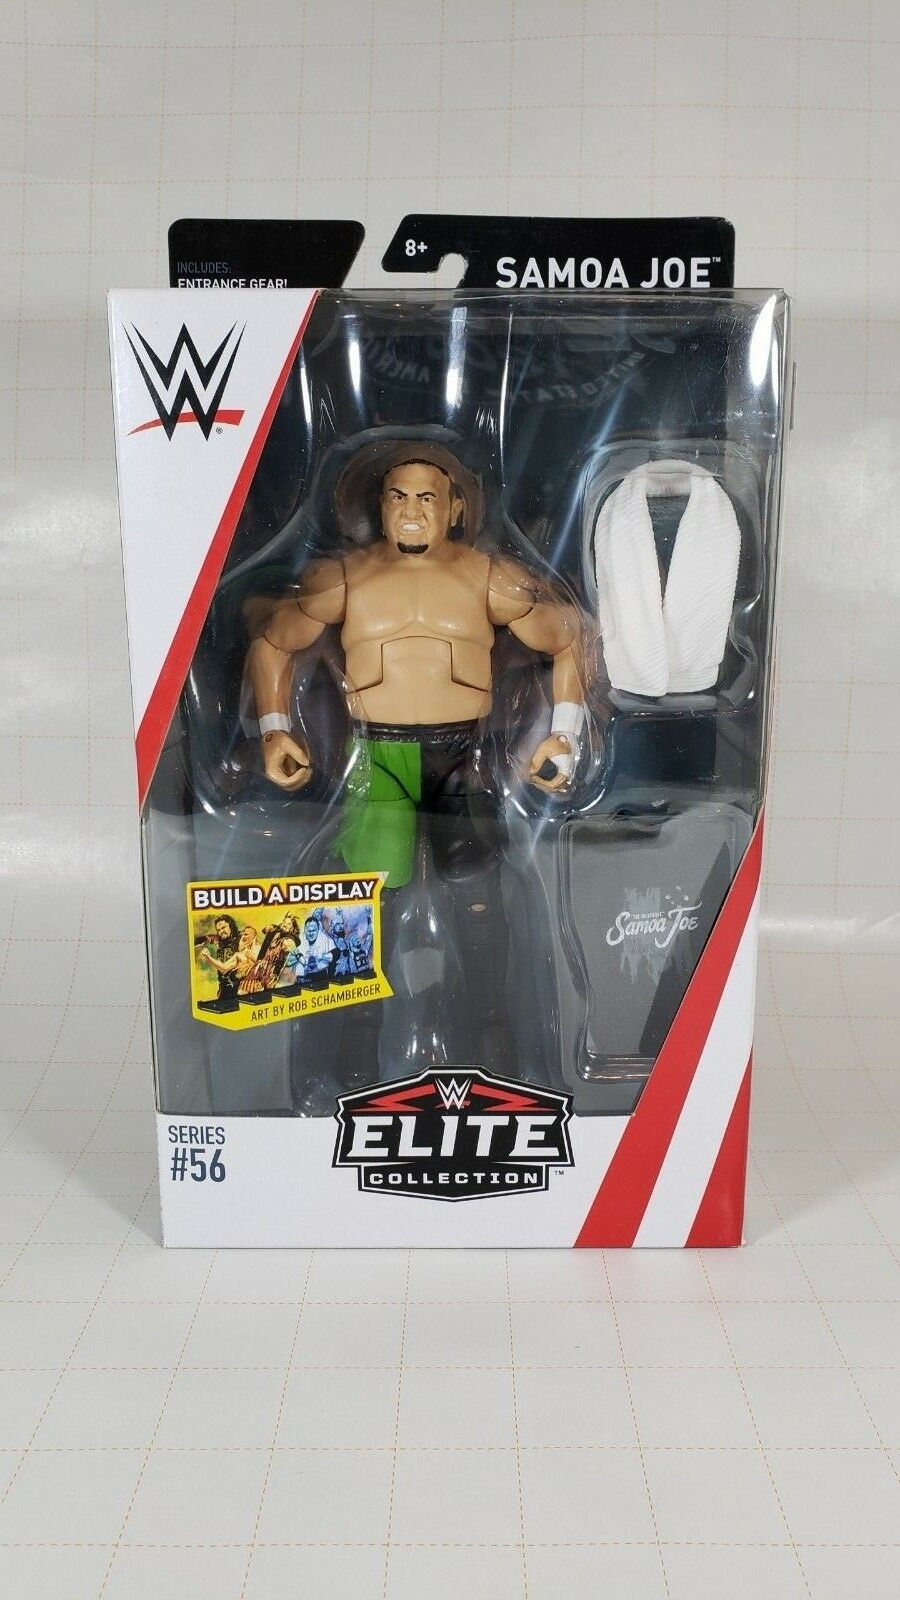 WWE Elite Collection Series 56 Action Figure Toy - Samoa Joe - Mattel - NEW